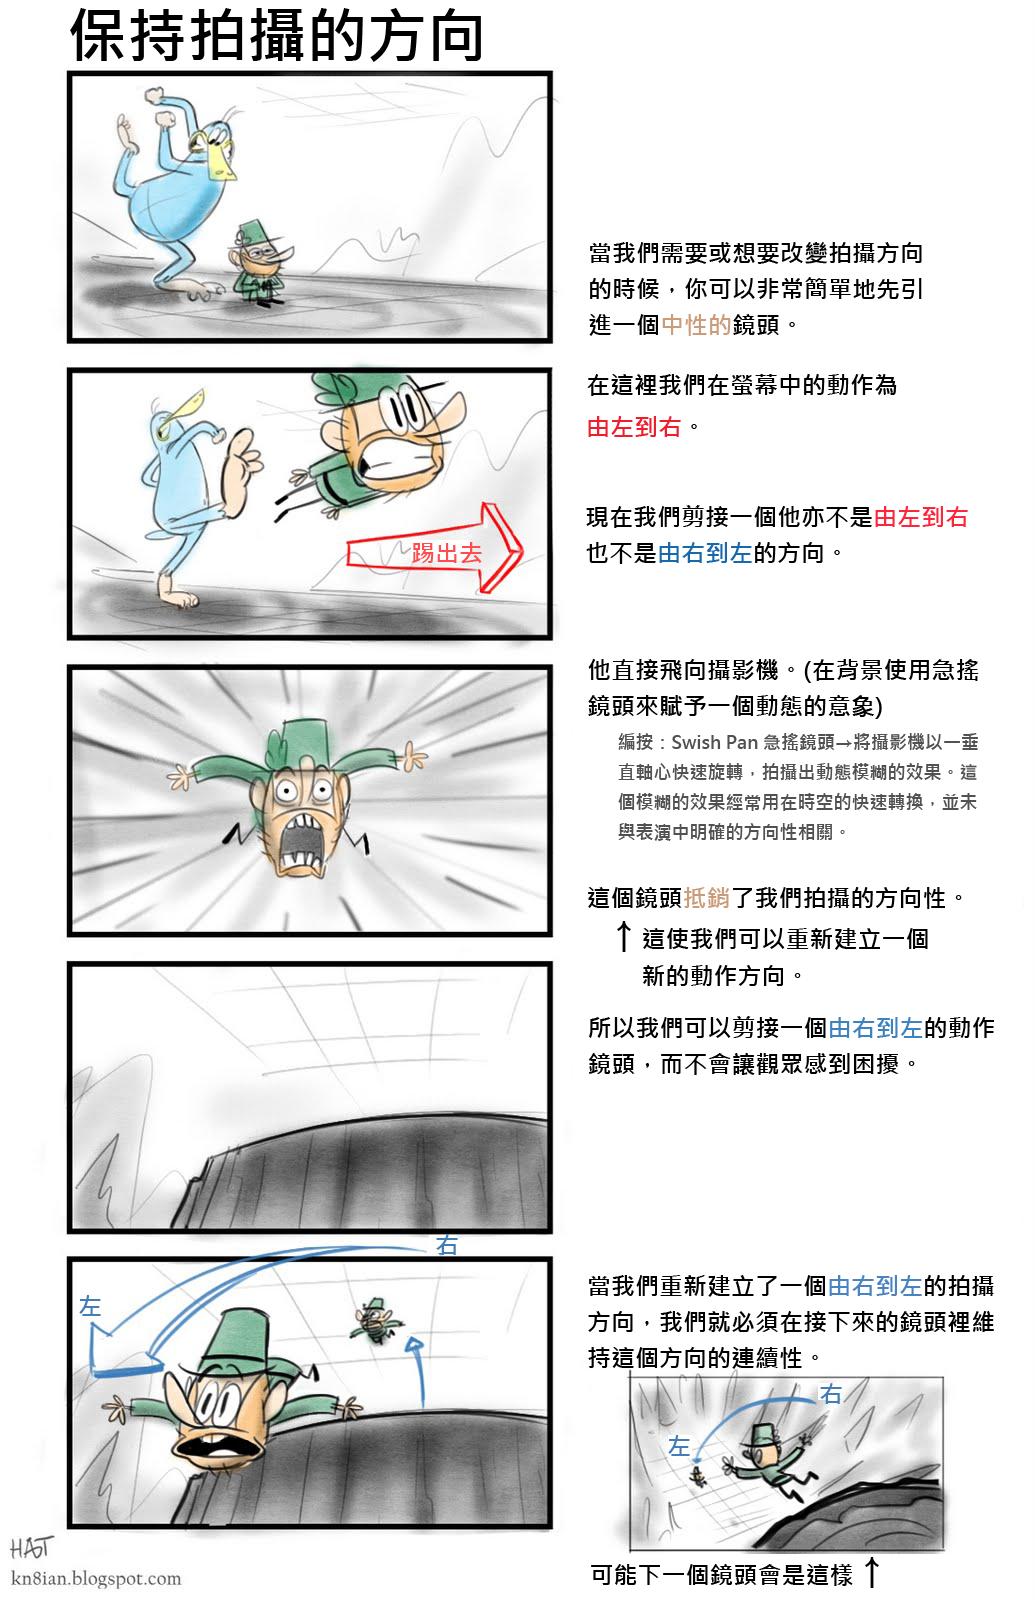 Storyboard_3_c